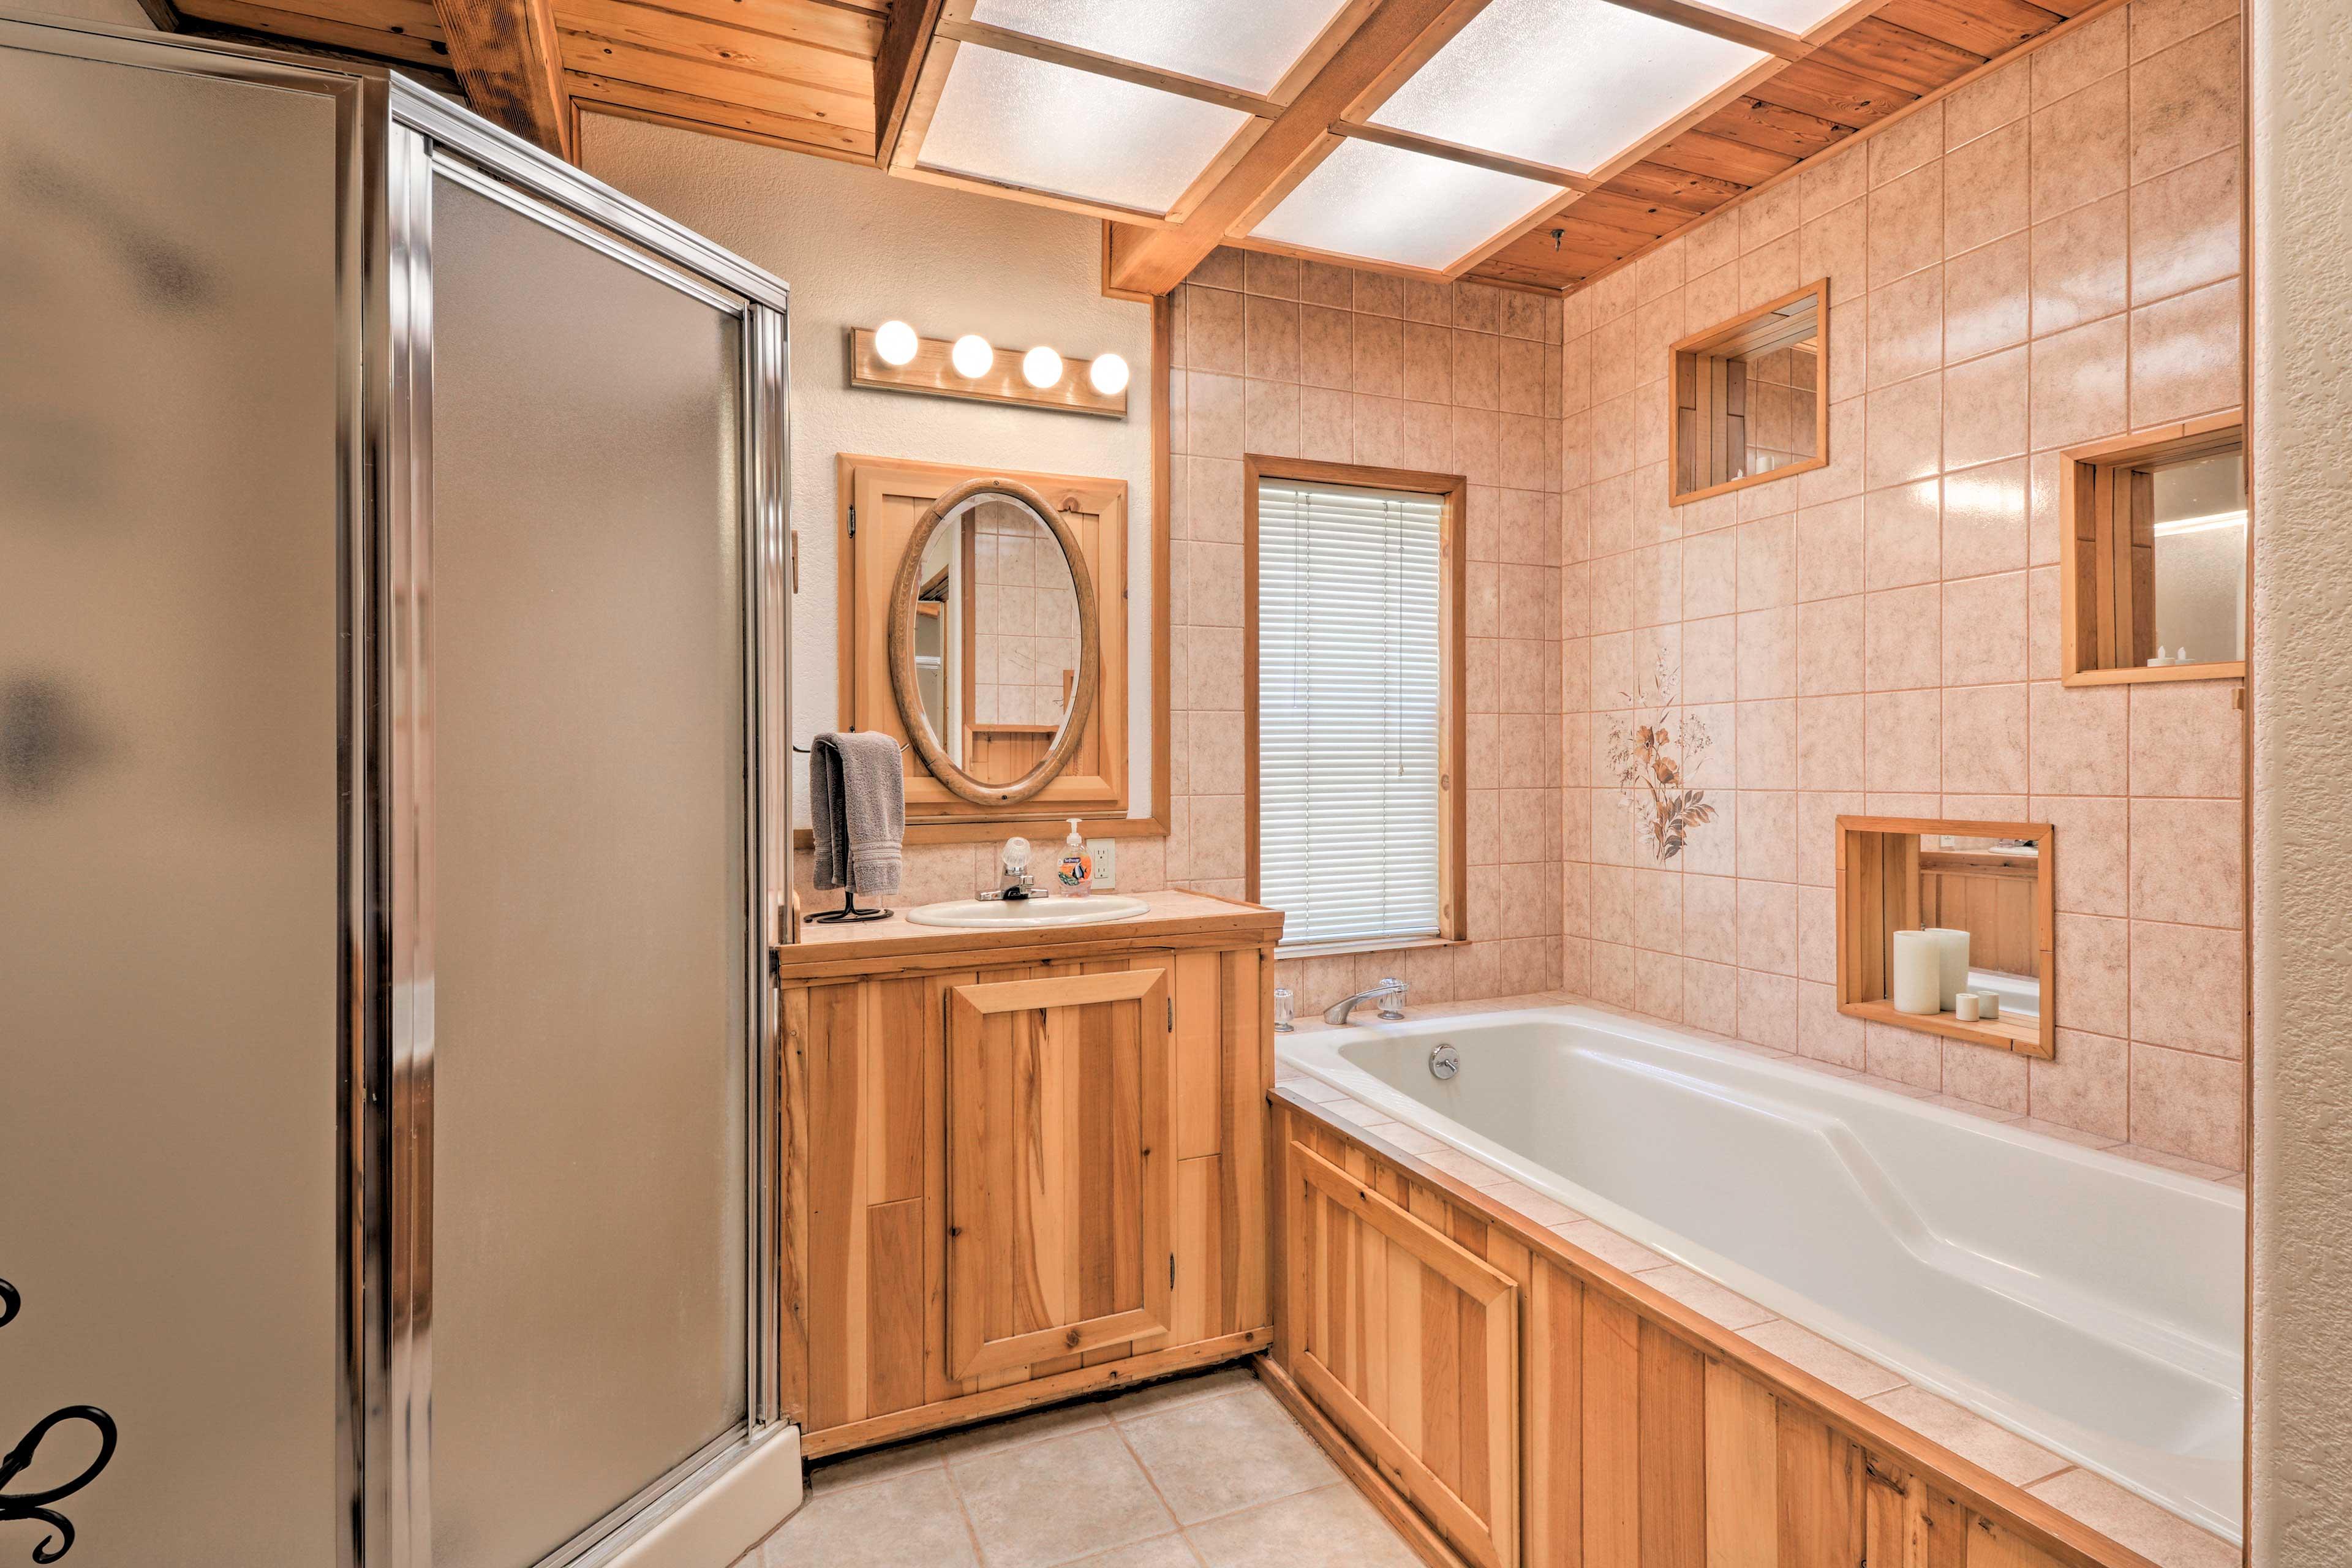 The master bathroom boasts a soaking tub and walk-in shower.